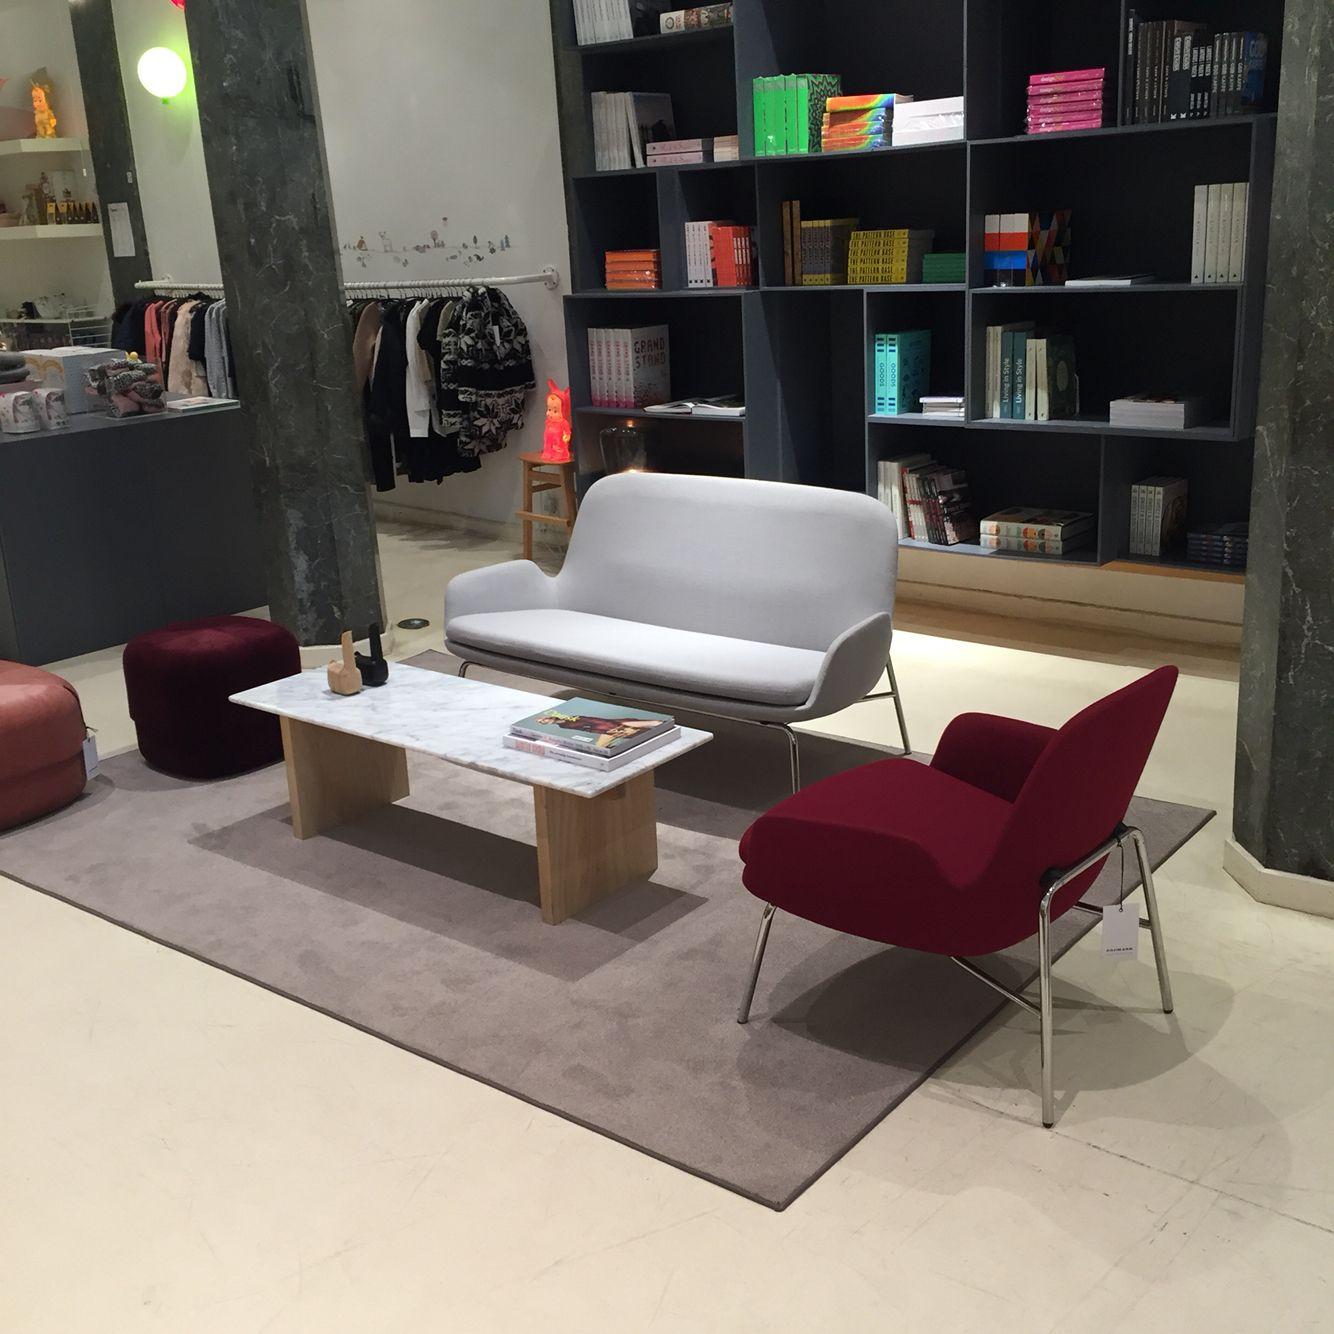 normann copenhagen sofa era bed for child by